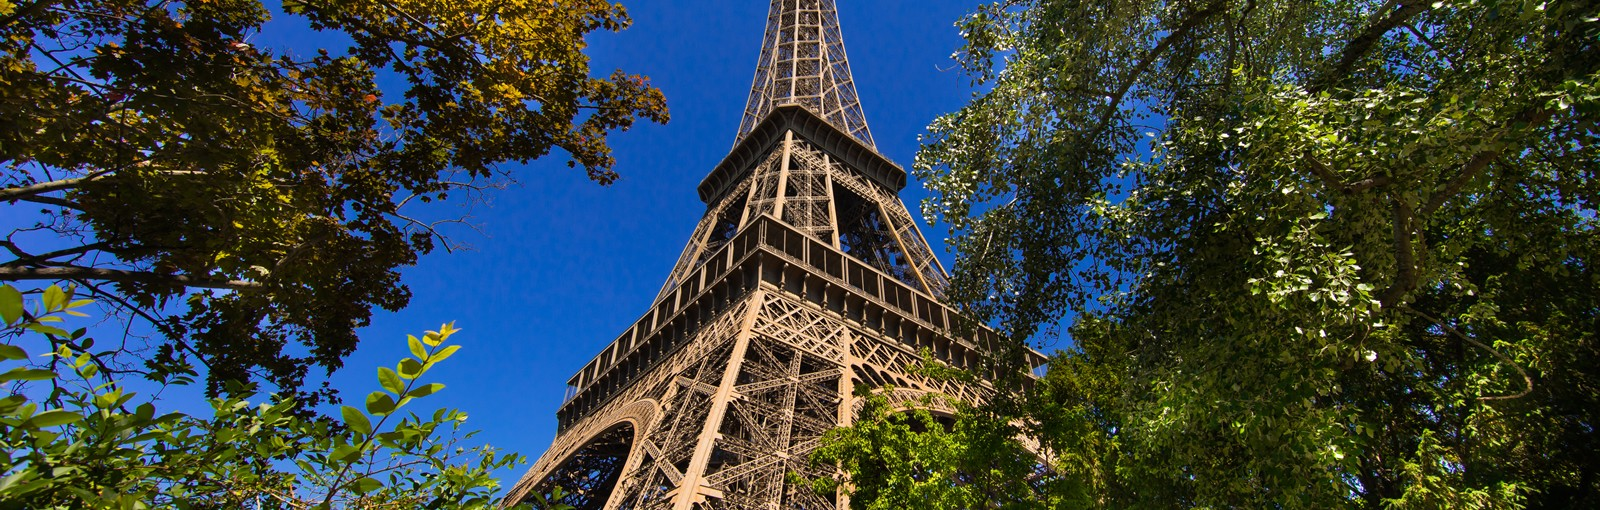 Tours Paris & Versailles full day tour - Sightseeing - Paris Tours